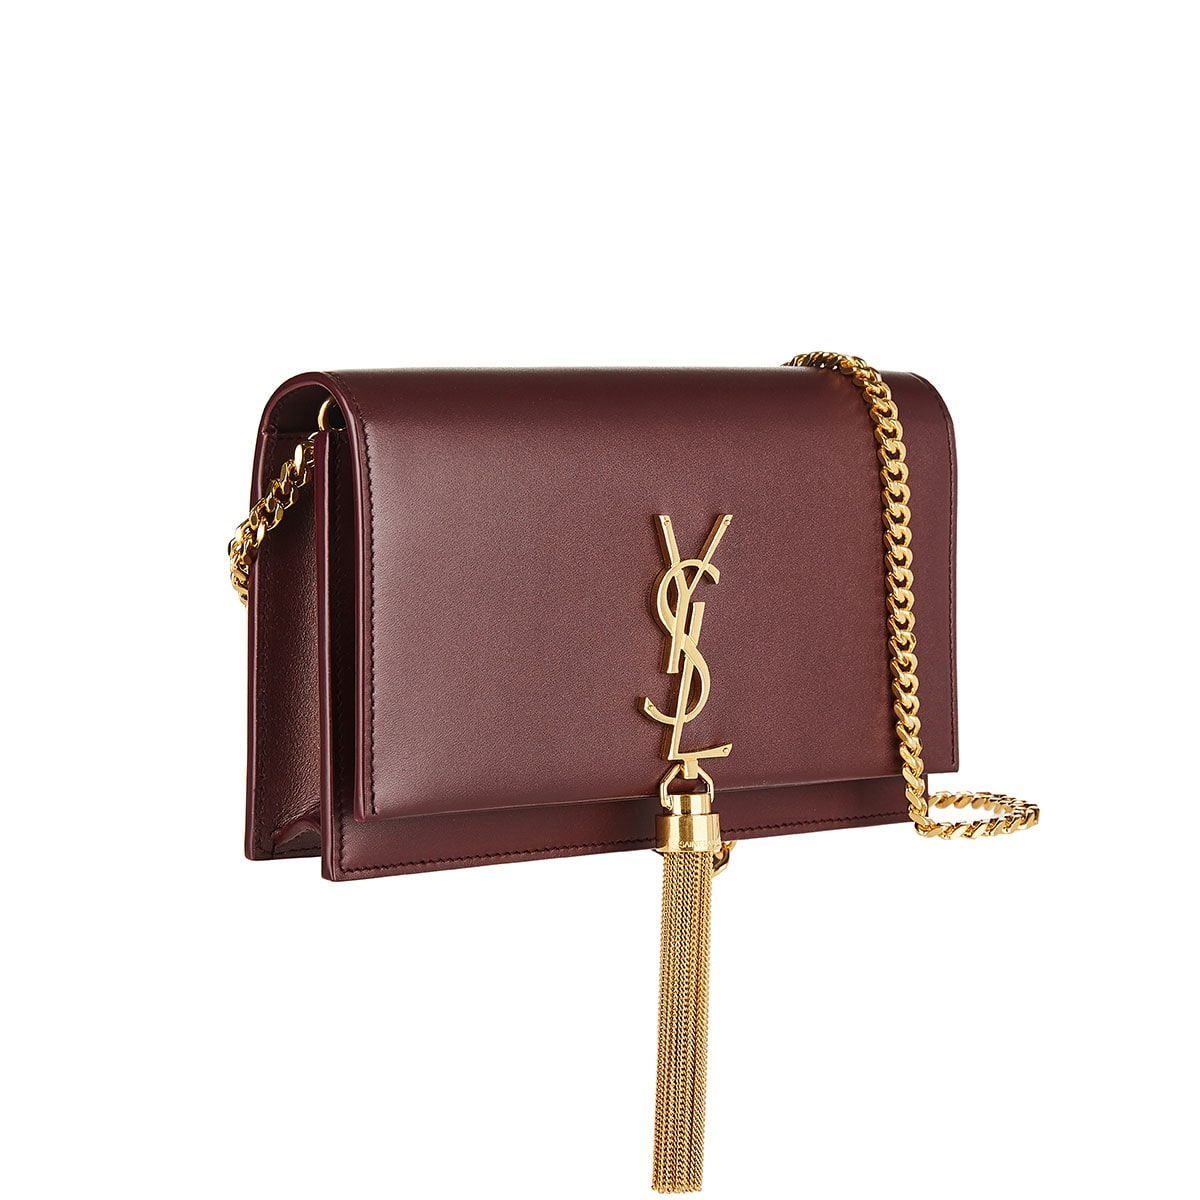 Kate tassel leather chain bag